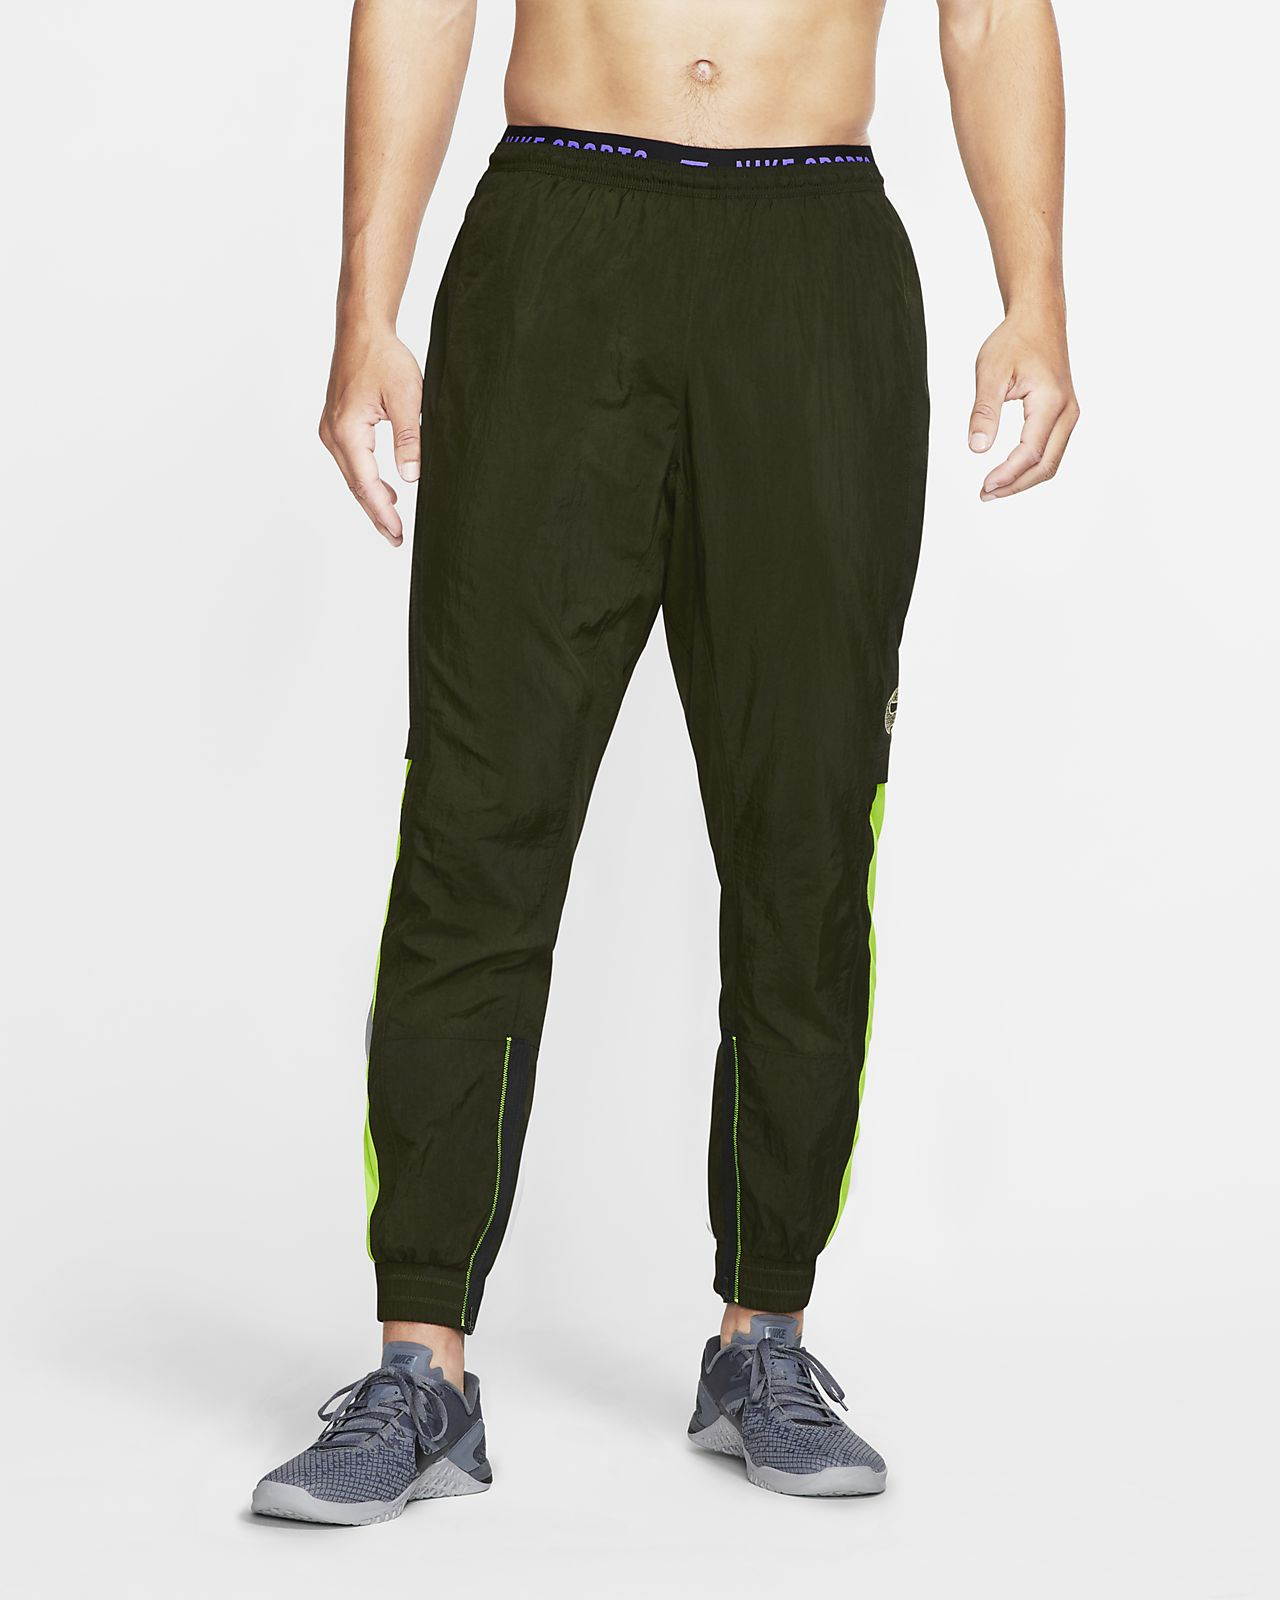 Nike Dri-FIT Flex Erkek Antrenman Eşofman Altı